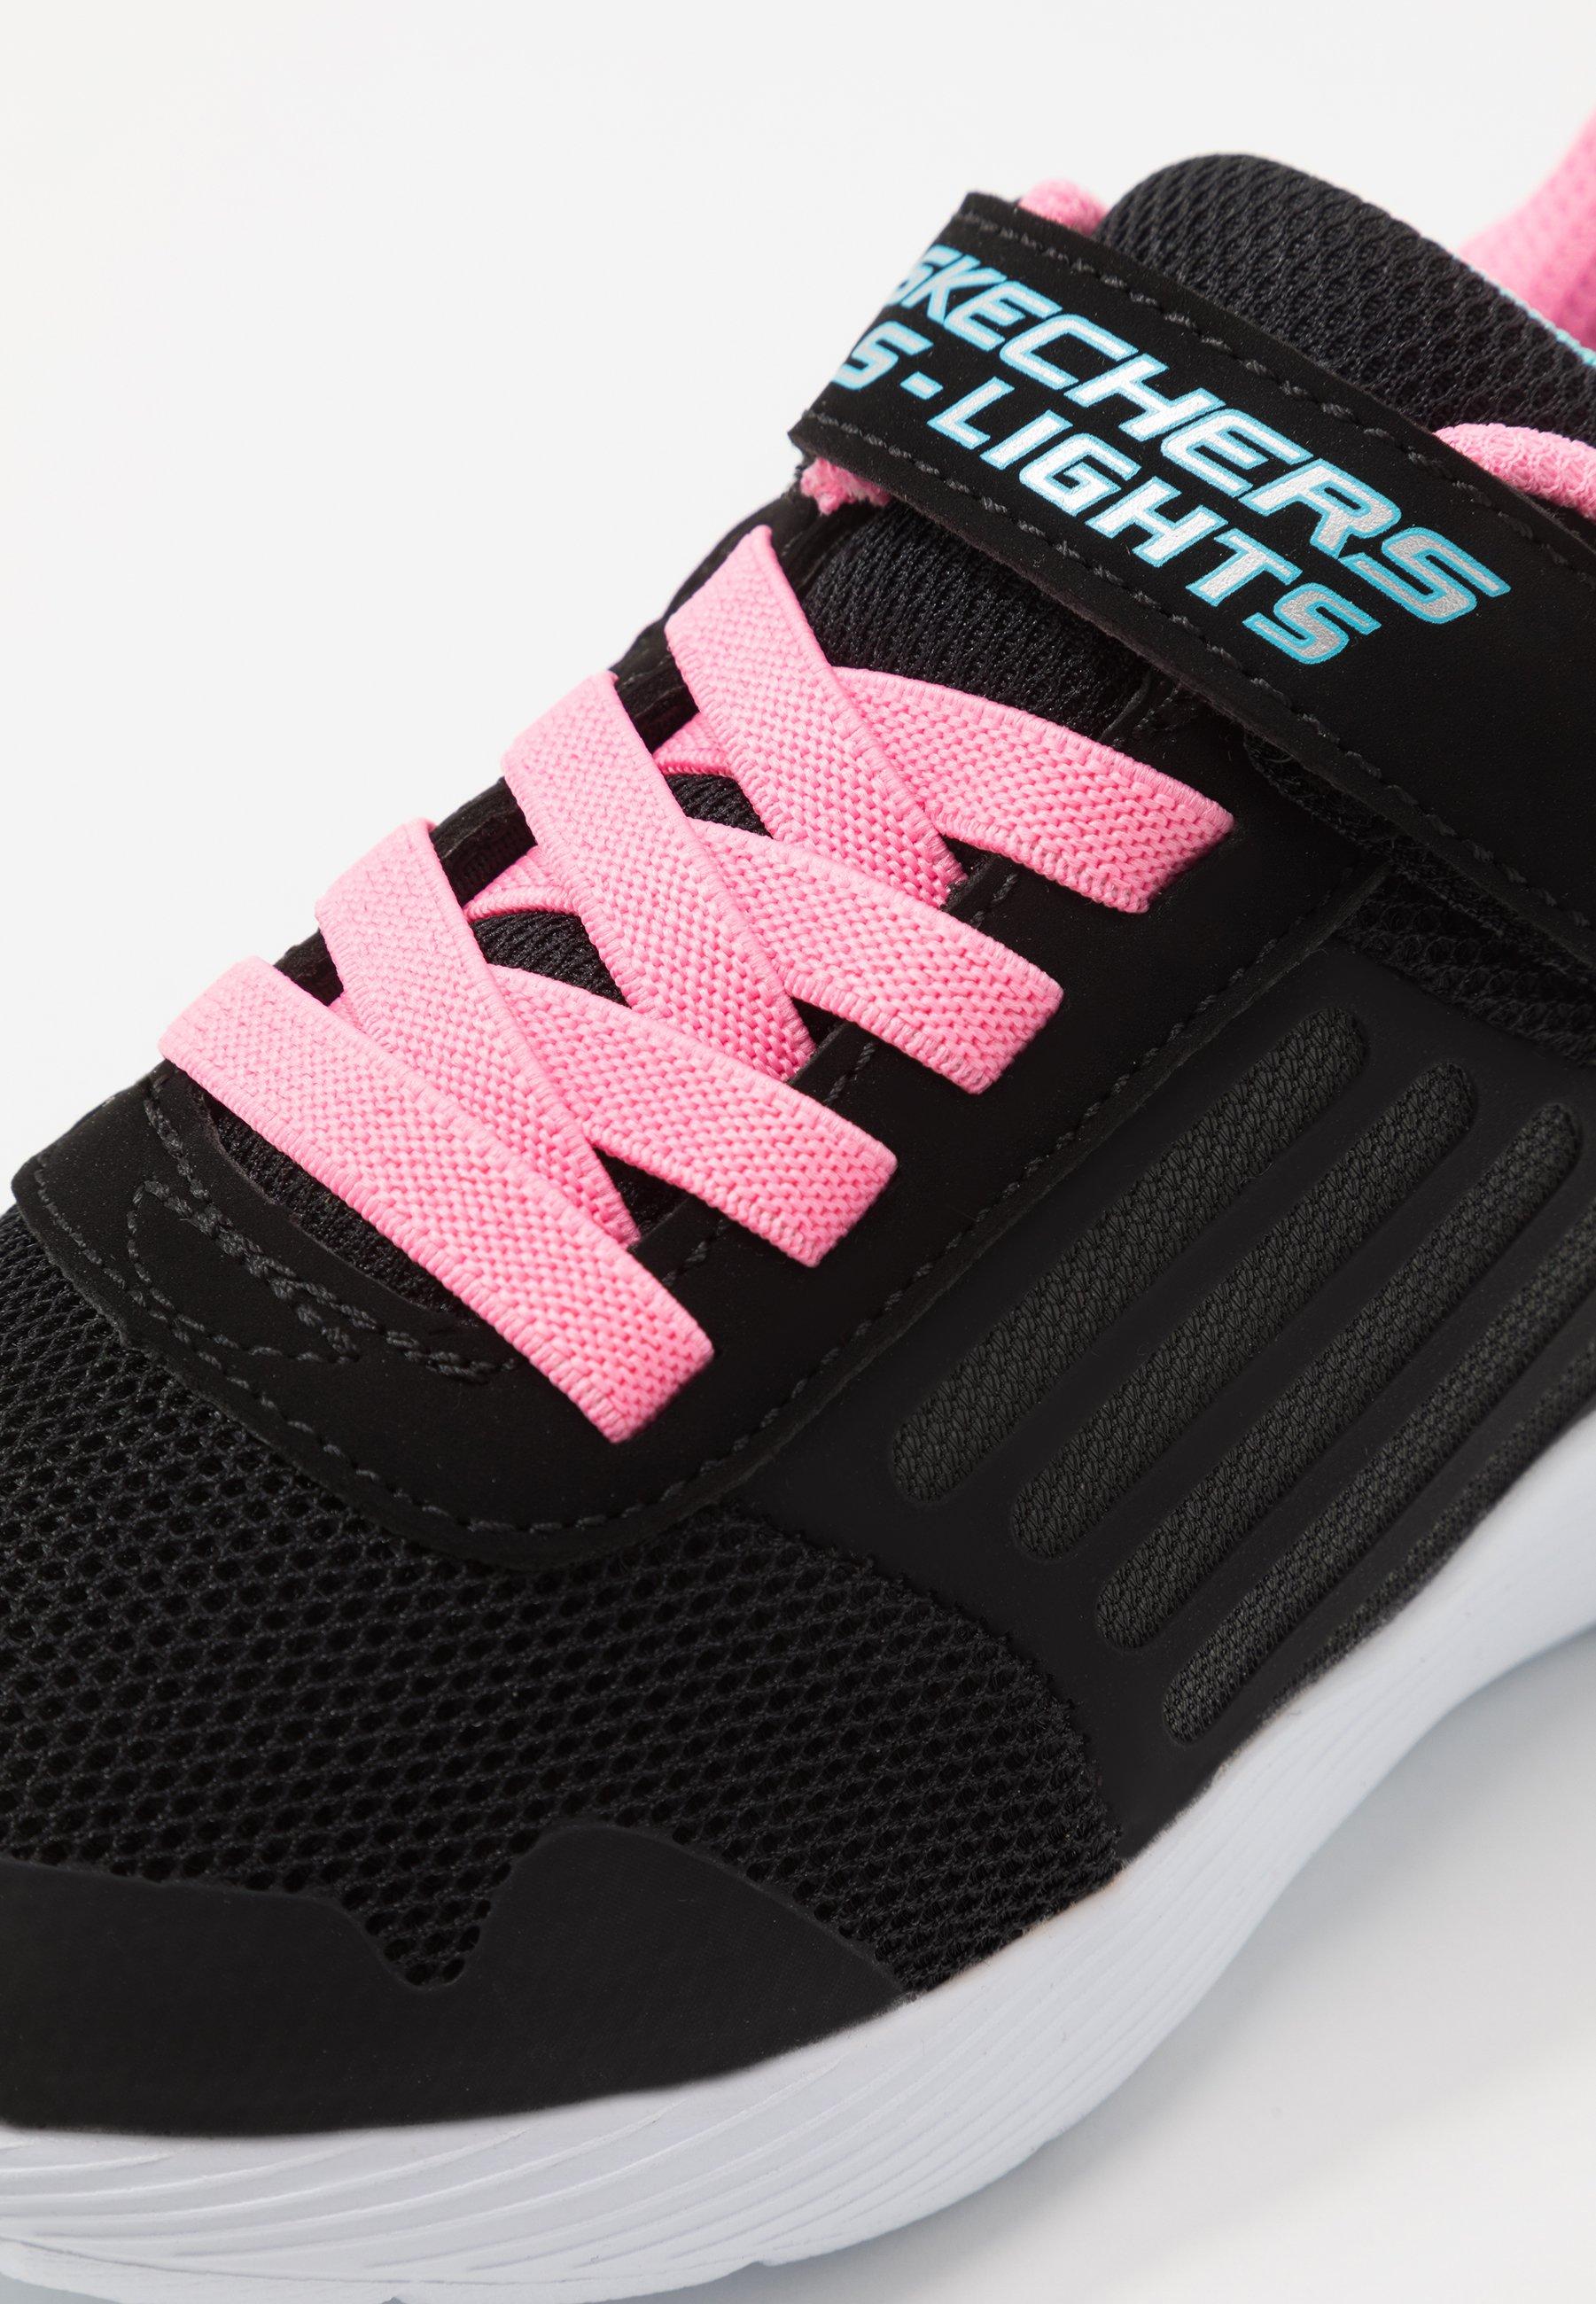 SKECHERS Dyna Lite scarpa sportiva bimba rosa fluo